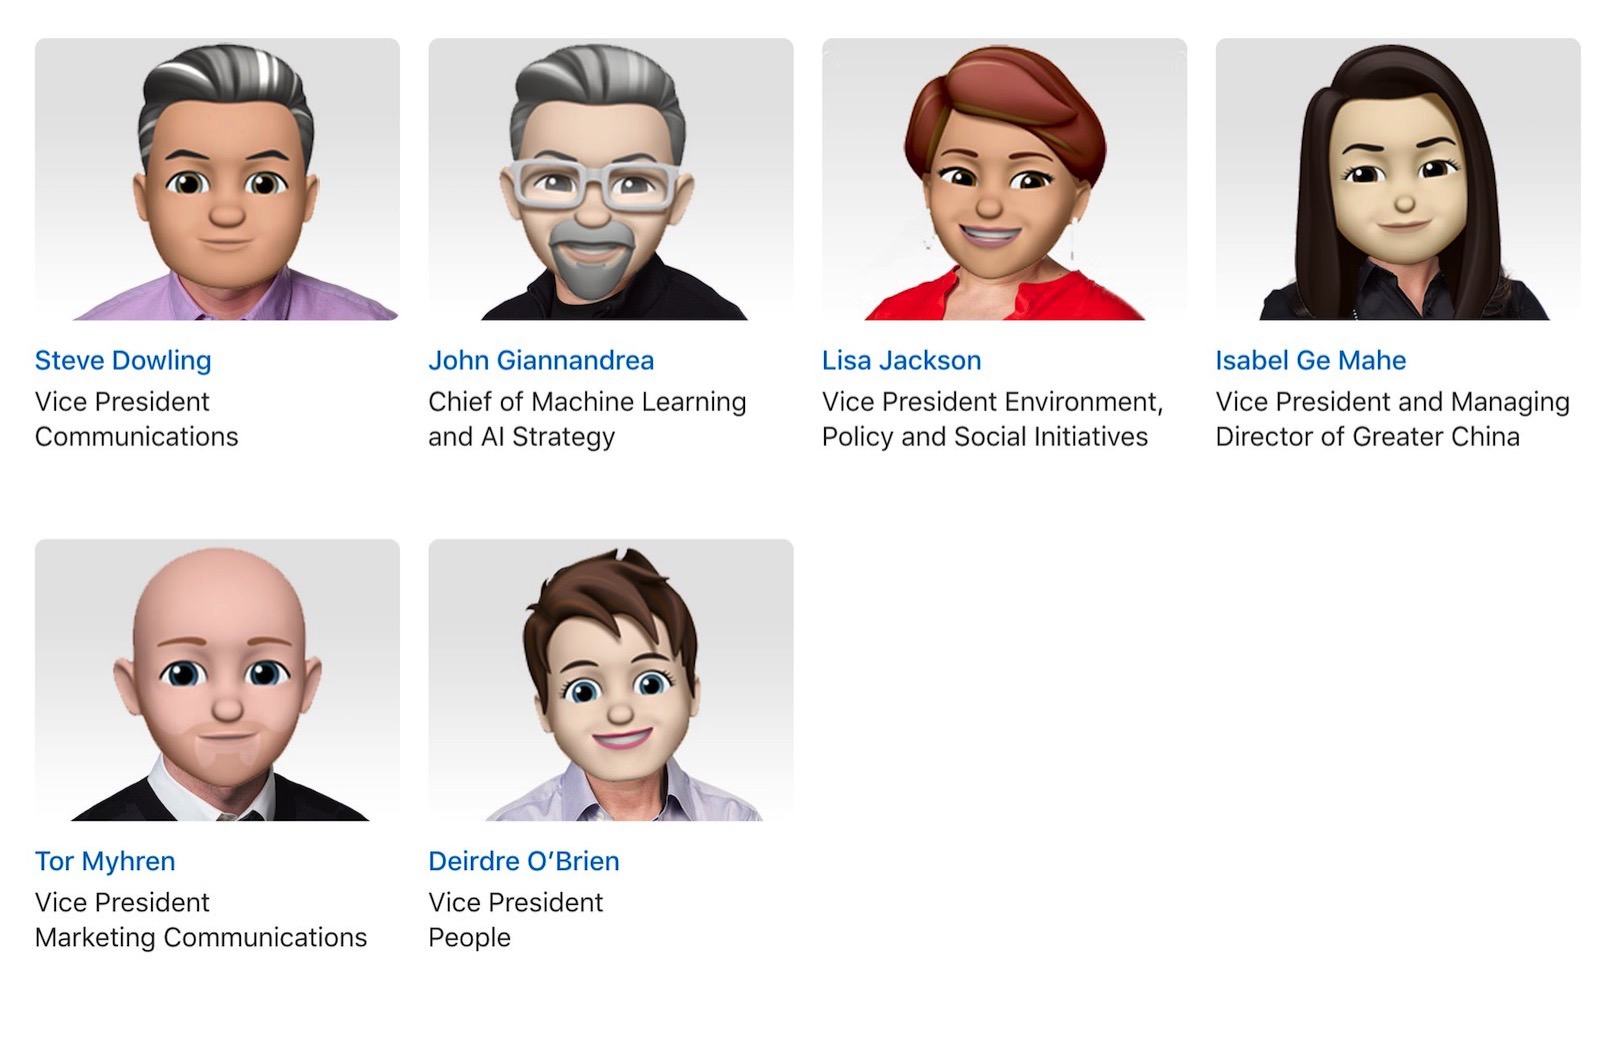 Executives-Profiles-in-Emoji-3.jpg